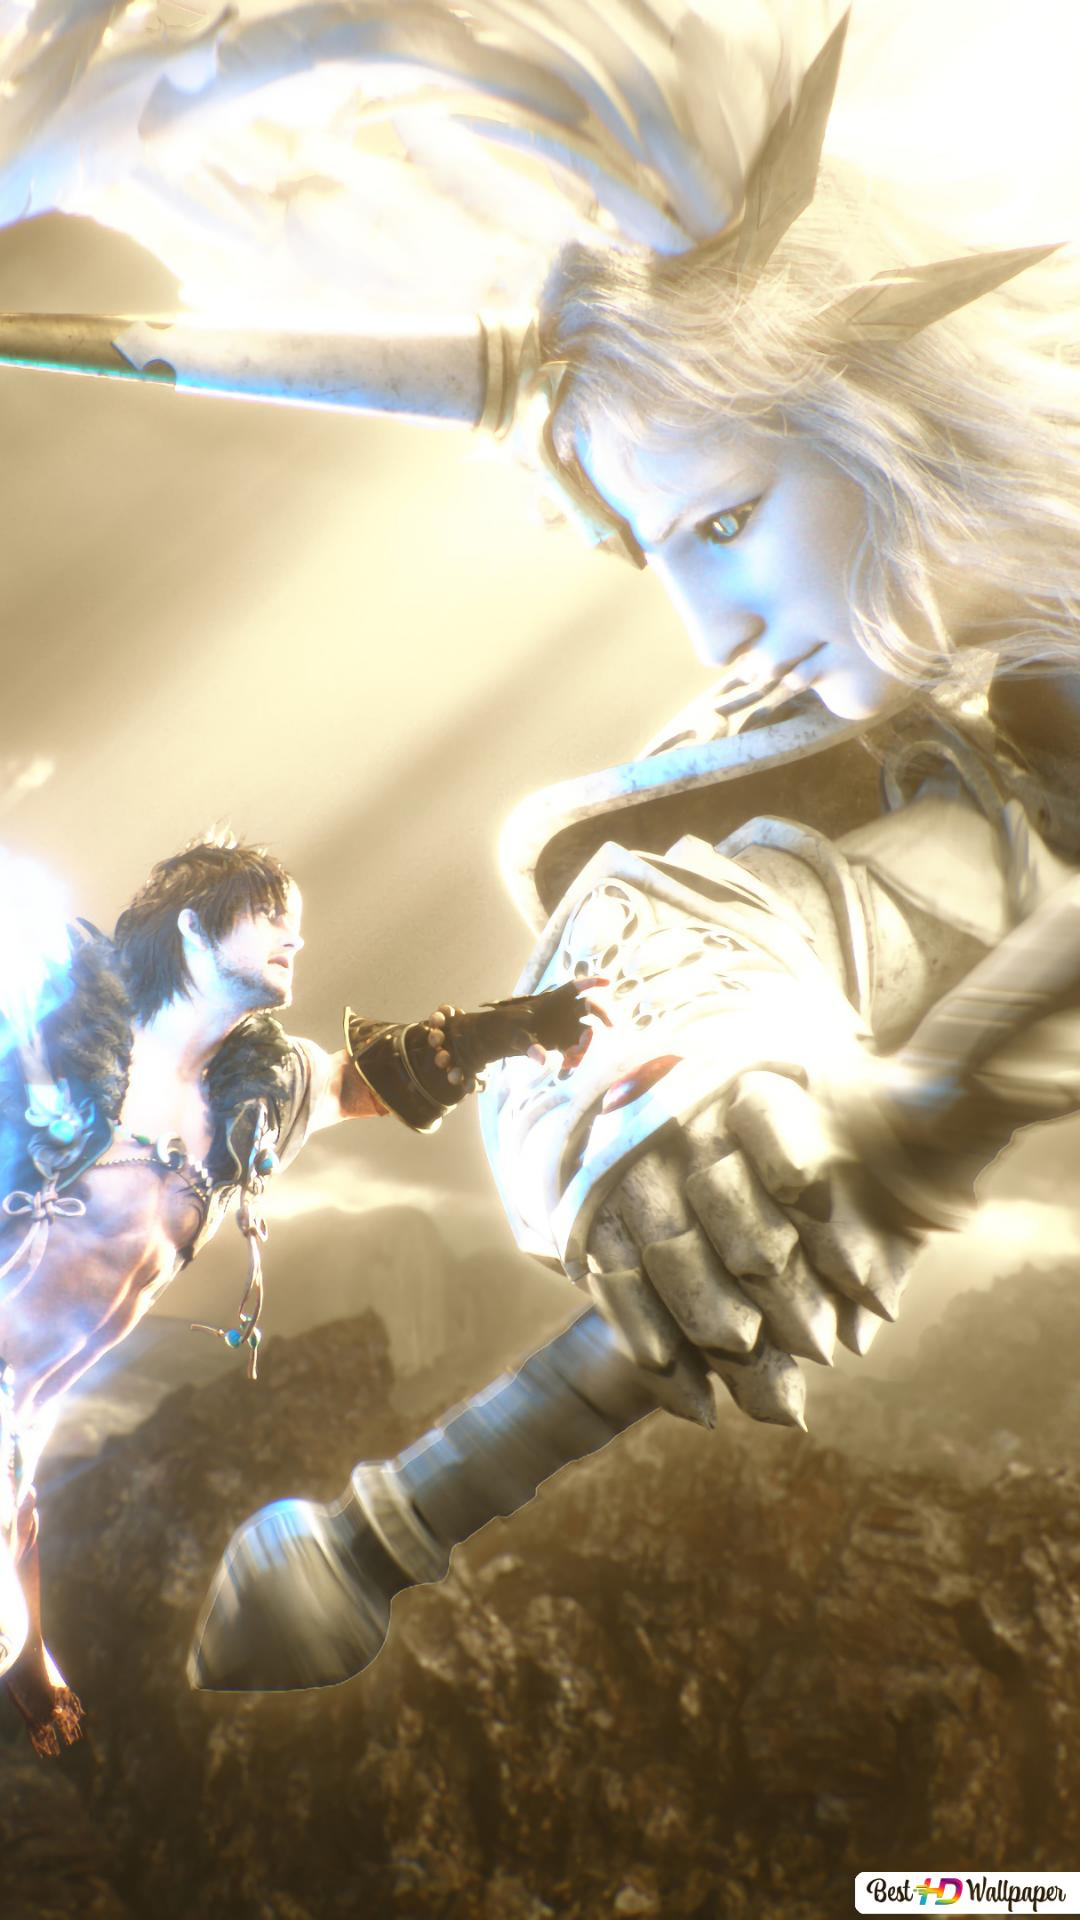 Final Fantasy Xiv Shadowbringers 2019 Hd Wallpaper Download